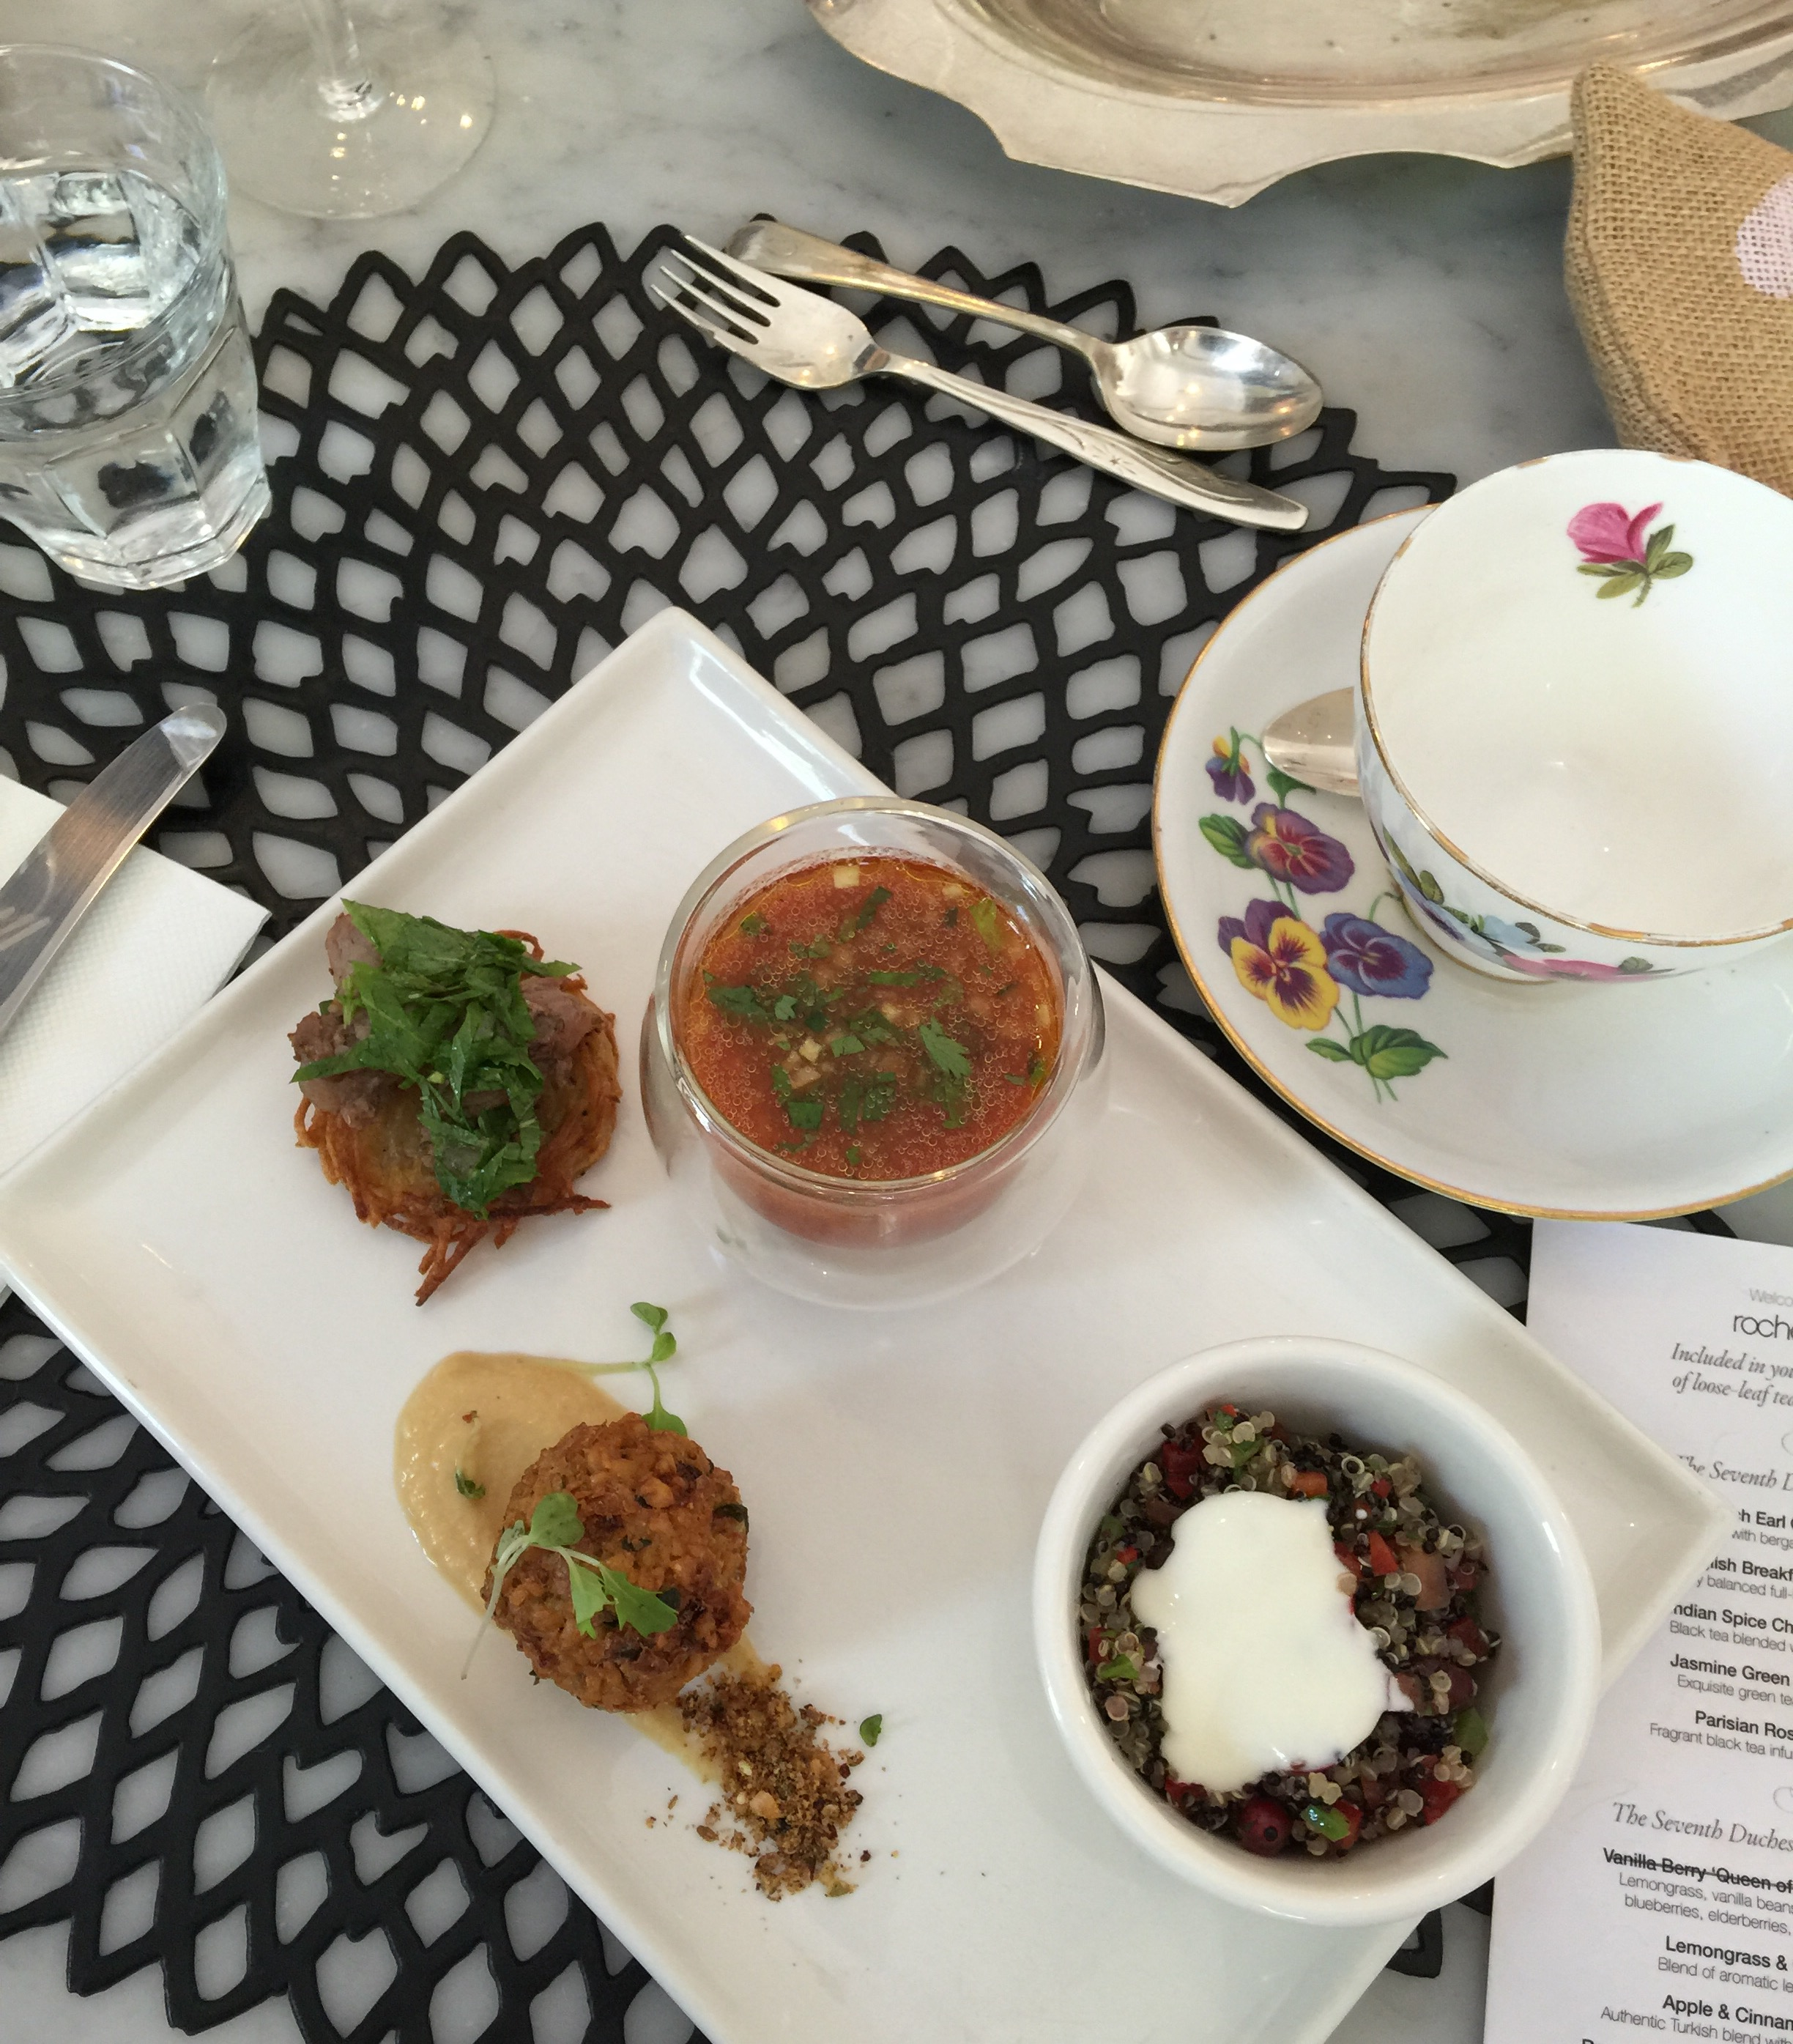 Savoury plate - potato rosti with lamb, gazpacho, quinoa, savoury bite